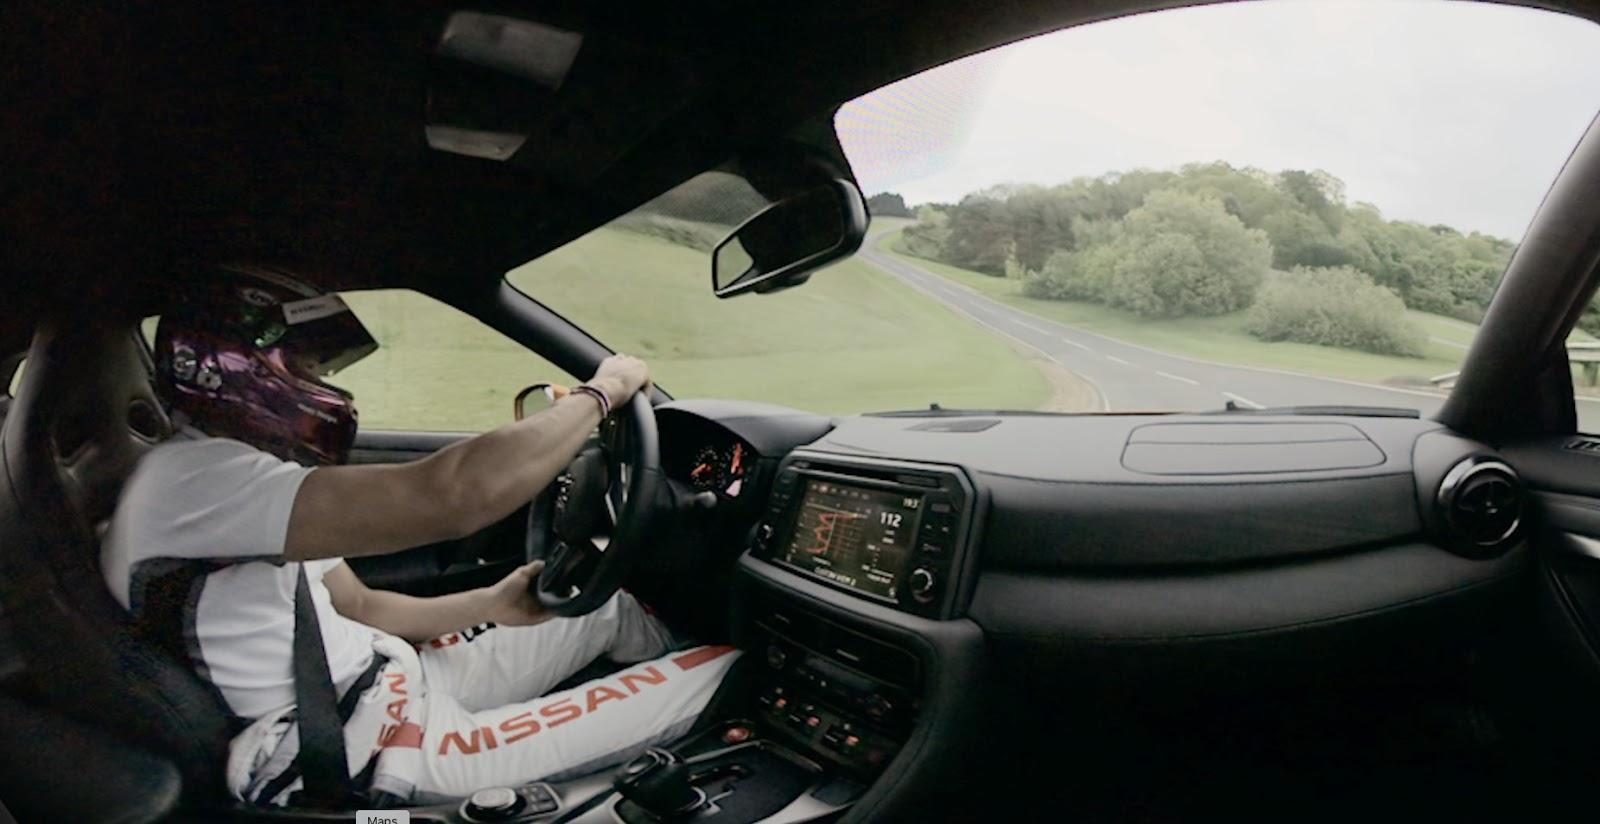 """H απόλυτη εμπειρία του νέου Nissan GT-R, έρχεται στο Goodwood, με τον παγκοσμίως πρώτο 4D εικονικής πραγματικότητας προσομοιωτή!"